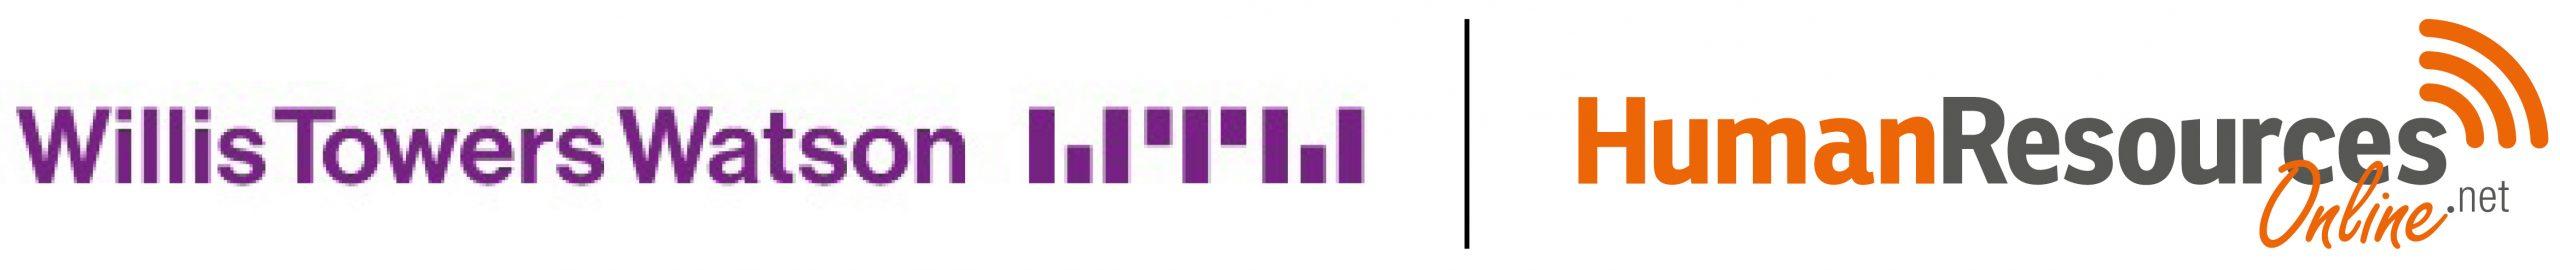 Workday x HRO logo